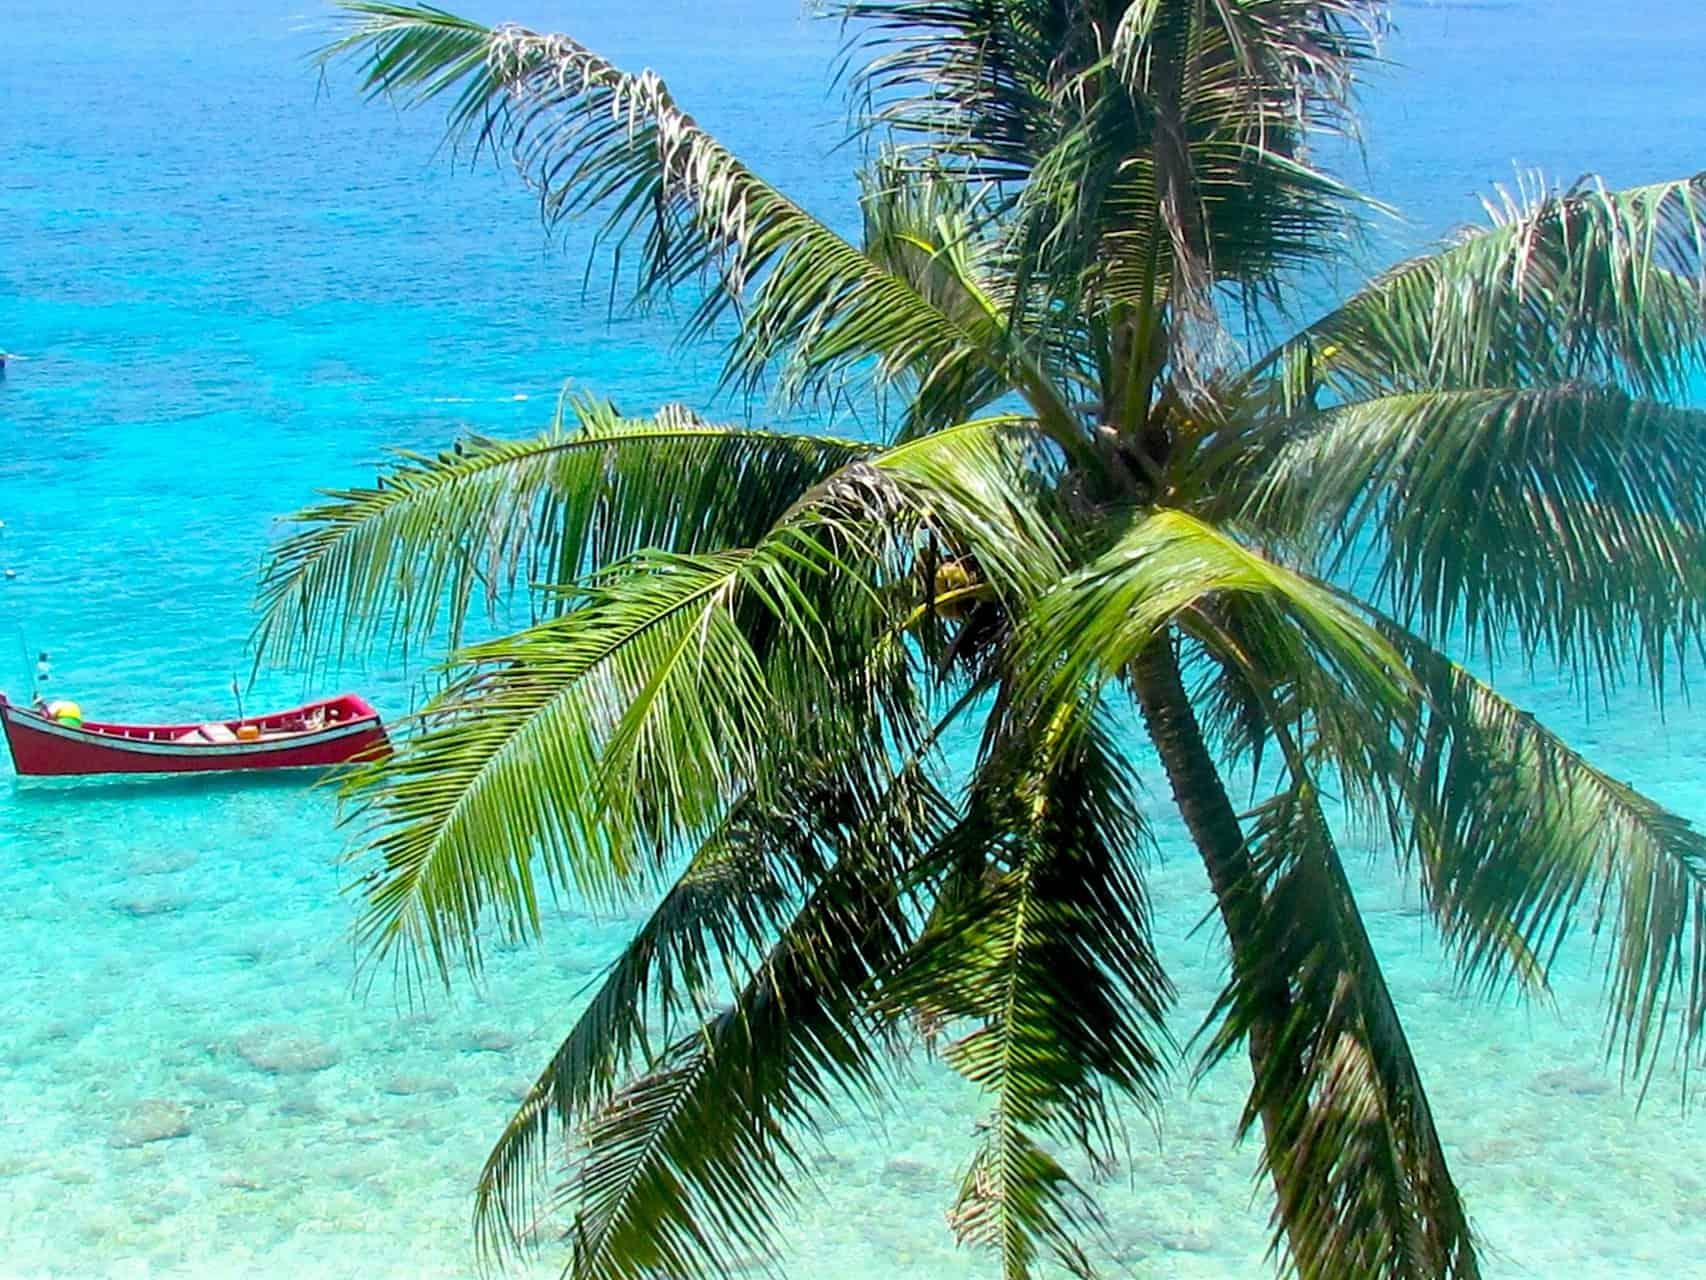 PULAU WEH - JUNGLE MEETS BEACH - SUMATRA ECOTRAVEL